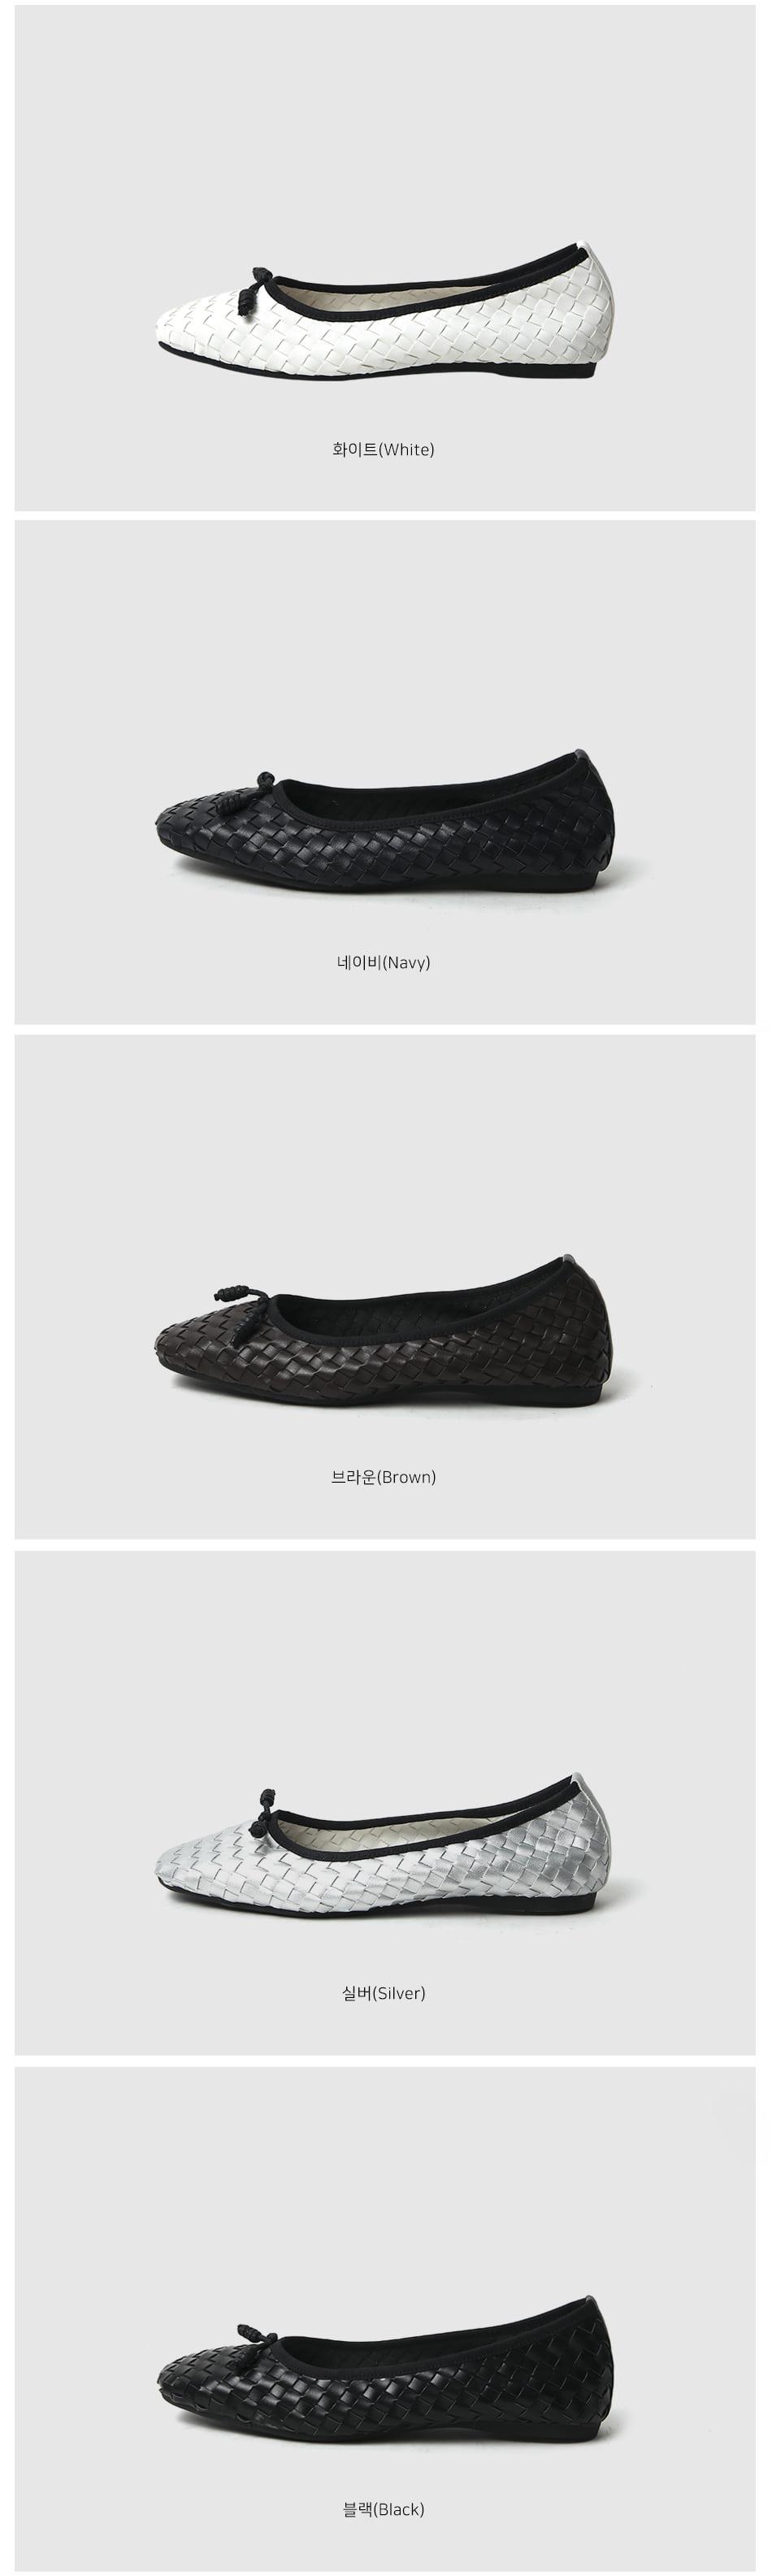 Sneak Height Flat Shoes 3cm